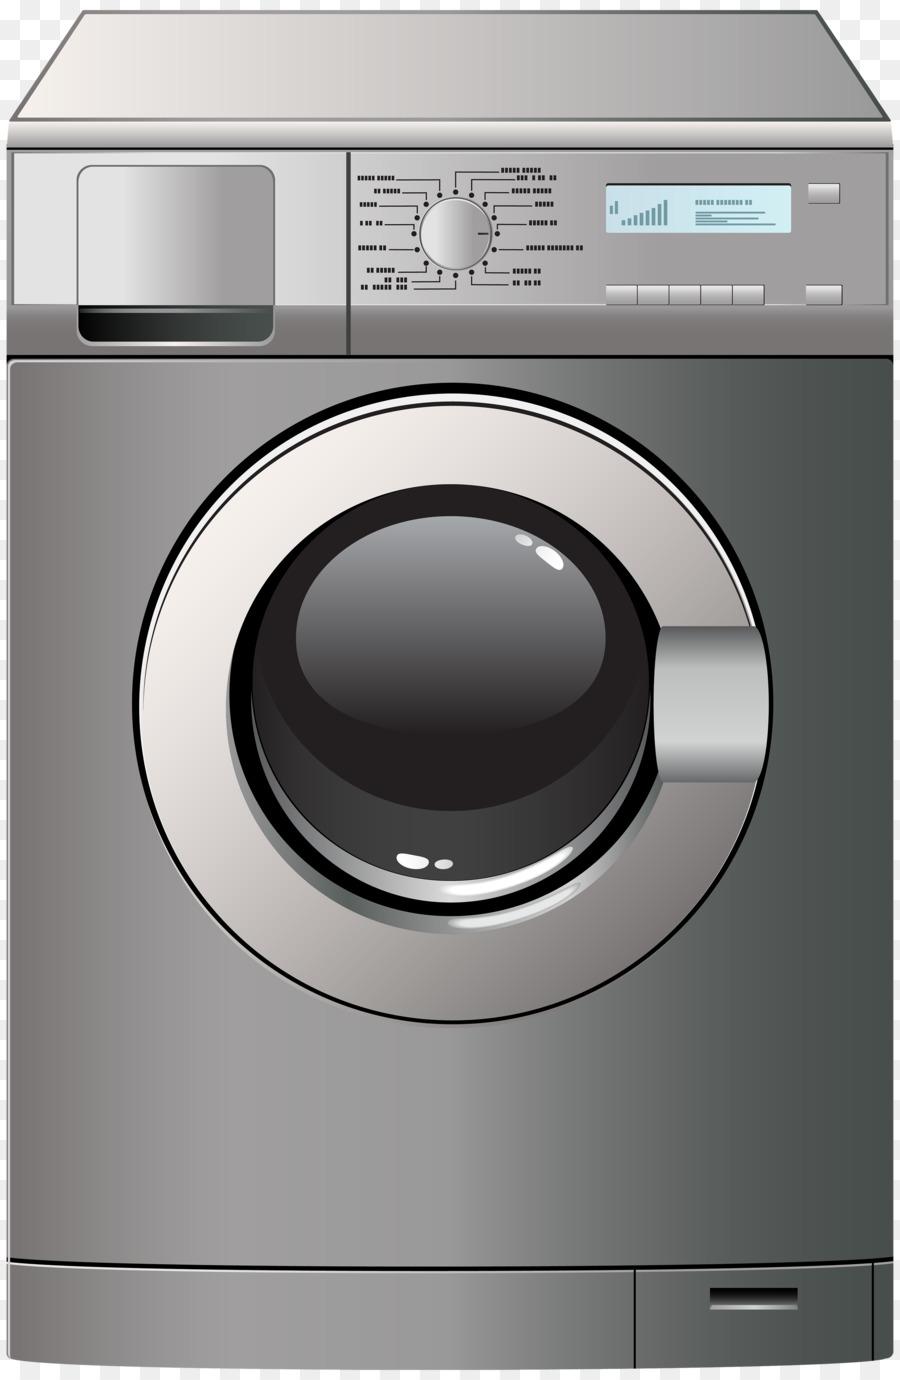 Transparent washing machine clipart clip art free stock Washing Machine clipart - Product, transparent clip art clip art free stock